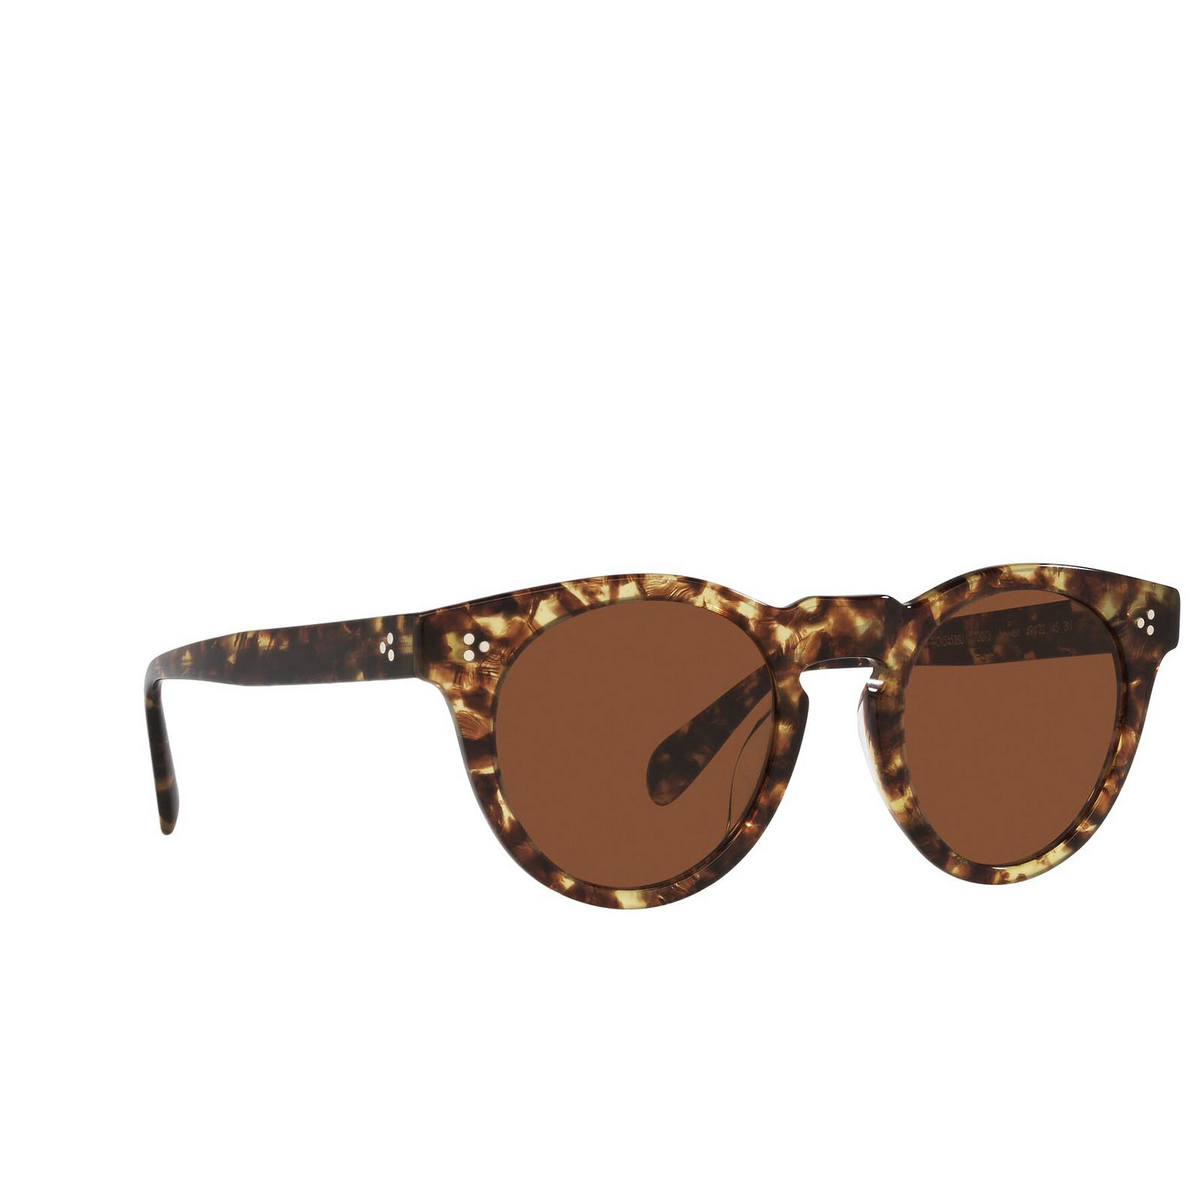 Oliver Peoples® Round Sunglasses: Lewen OV5453SU color 382 170073 - three-quarters view.